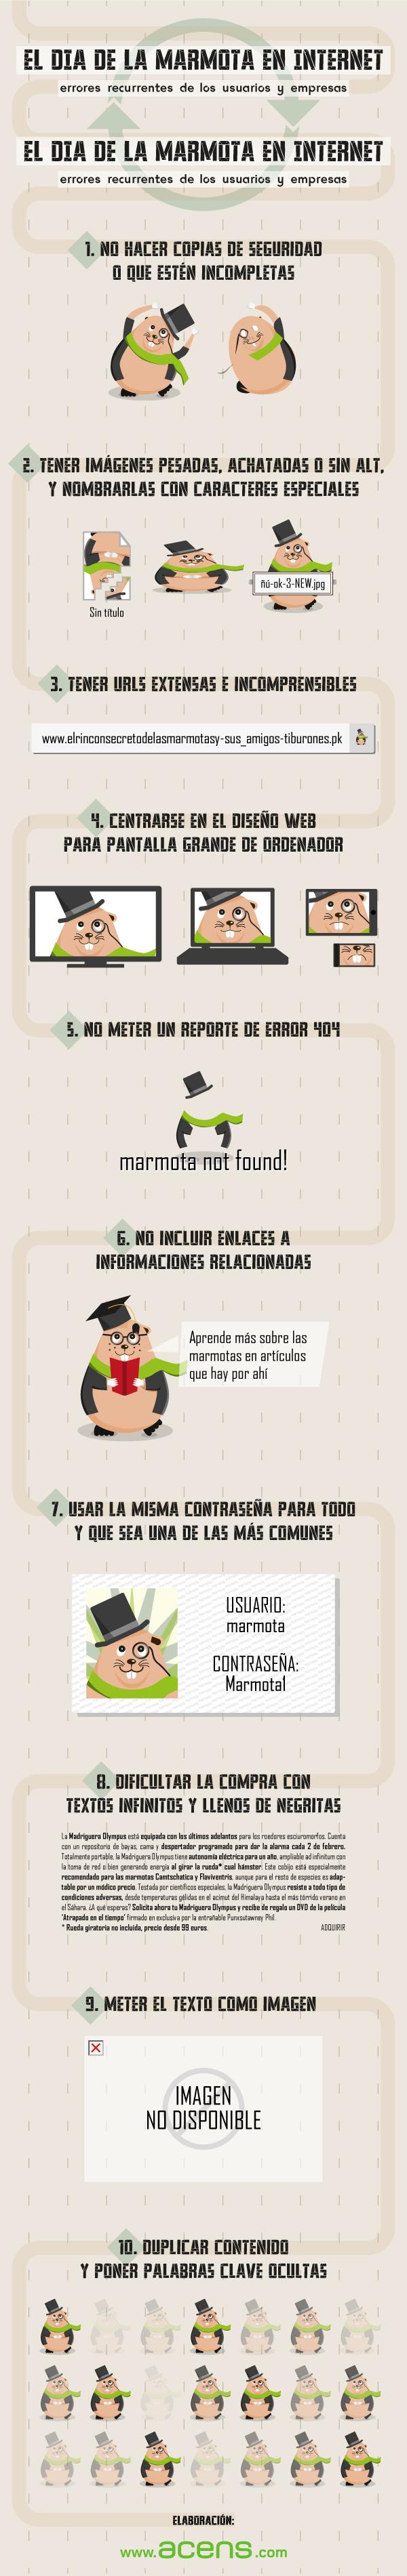 infografia-dia-de-la-marmota-acens